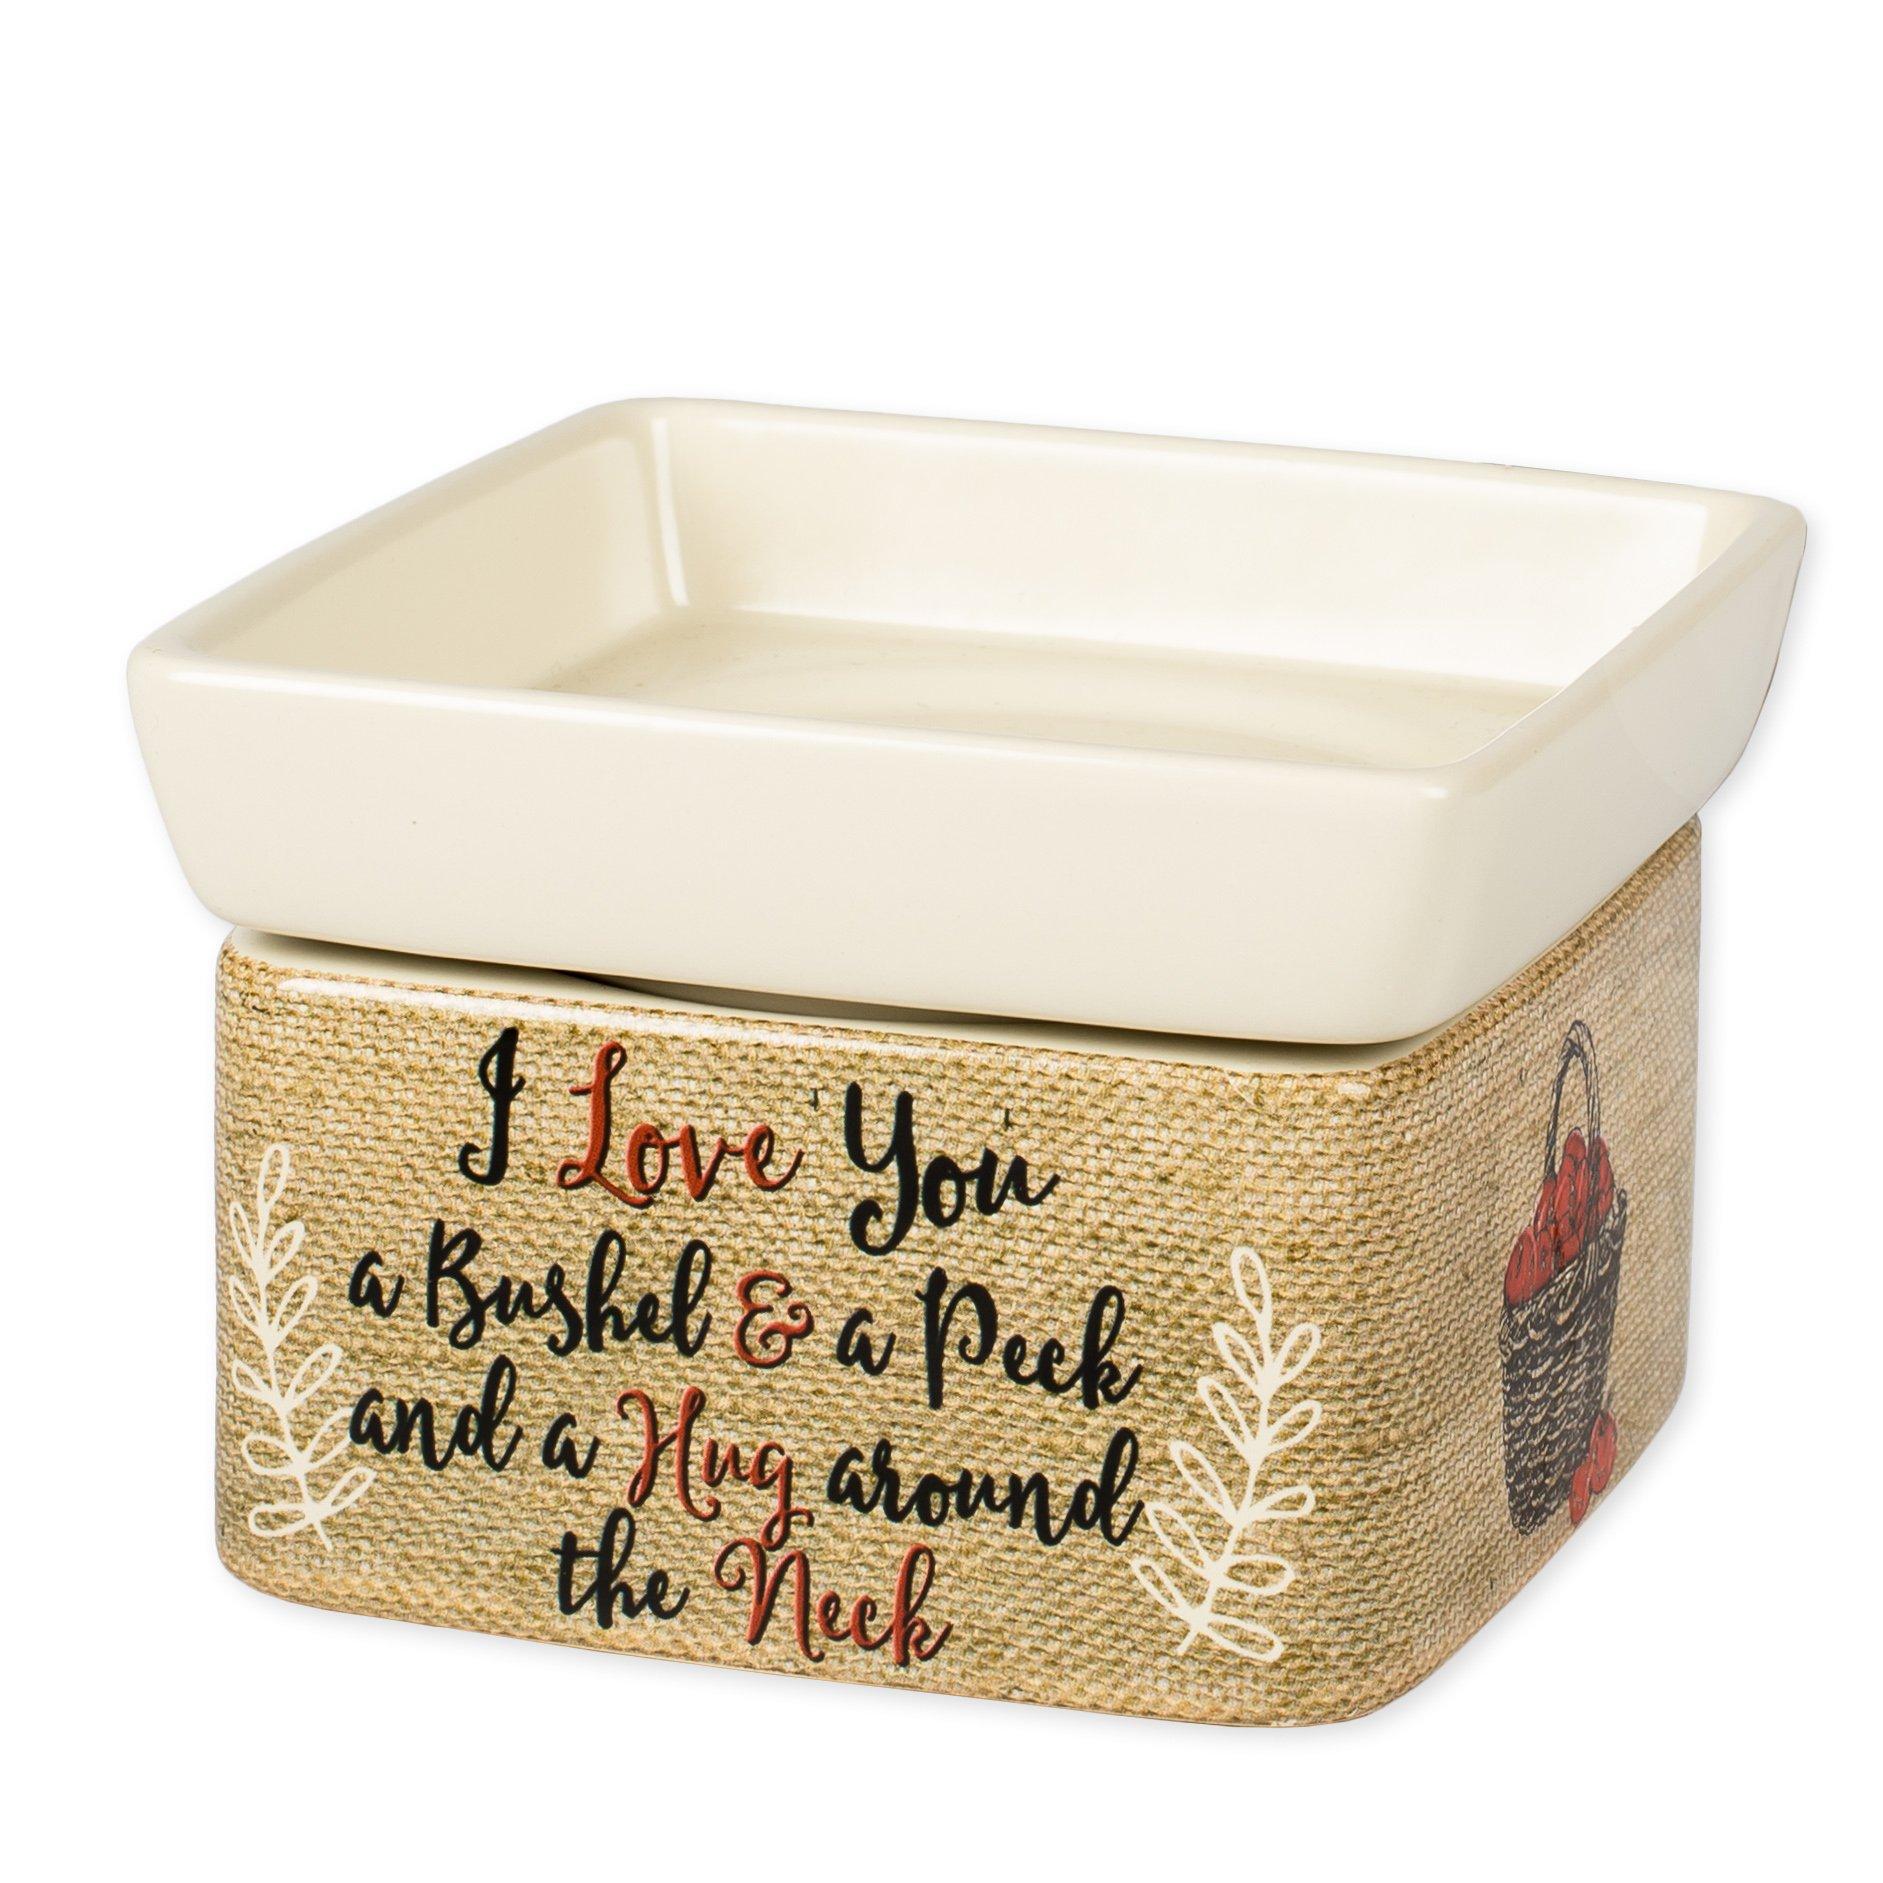 Elanze Designs I Love You A Bushel A Peck Burlap Apples Stoneware 2 in 1 Jar Candle Wax Tart Oil Warmer